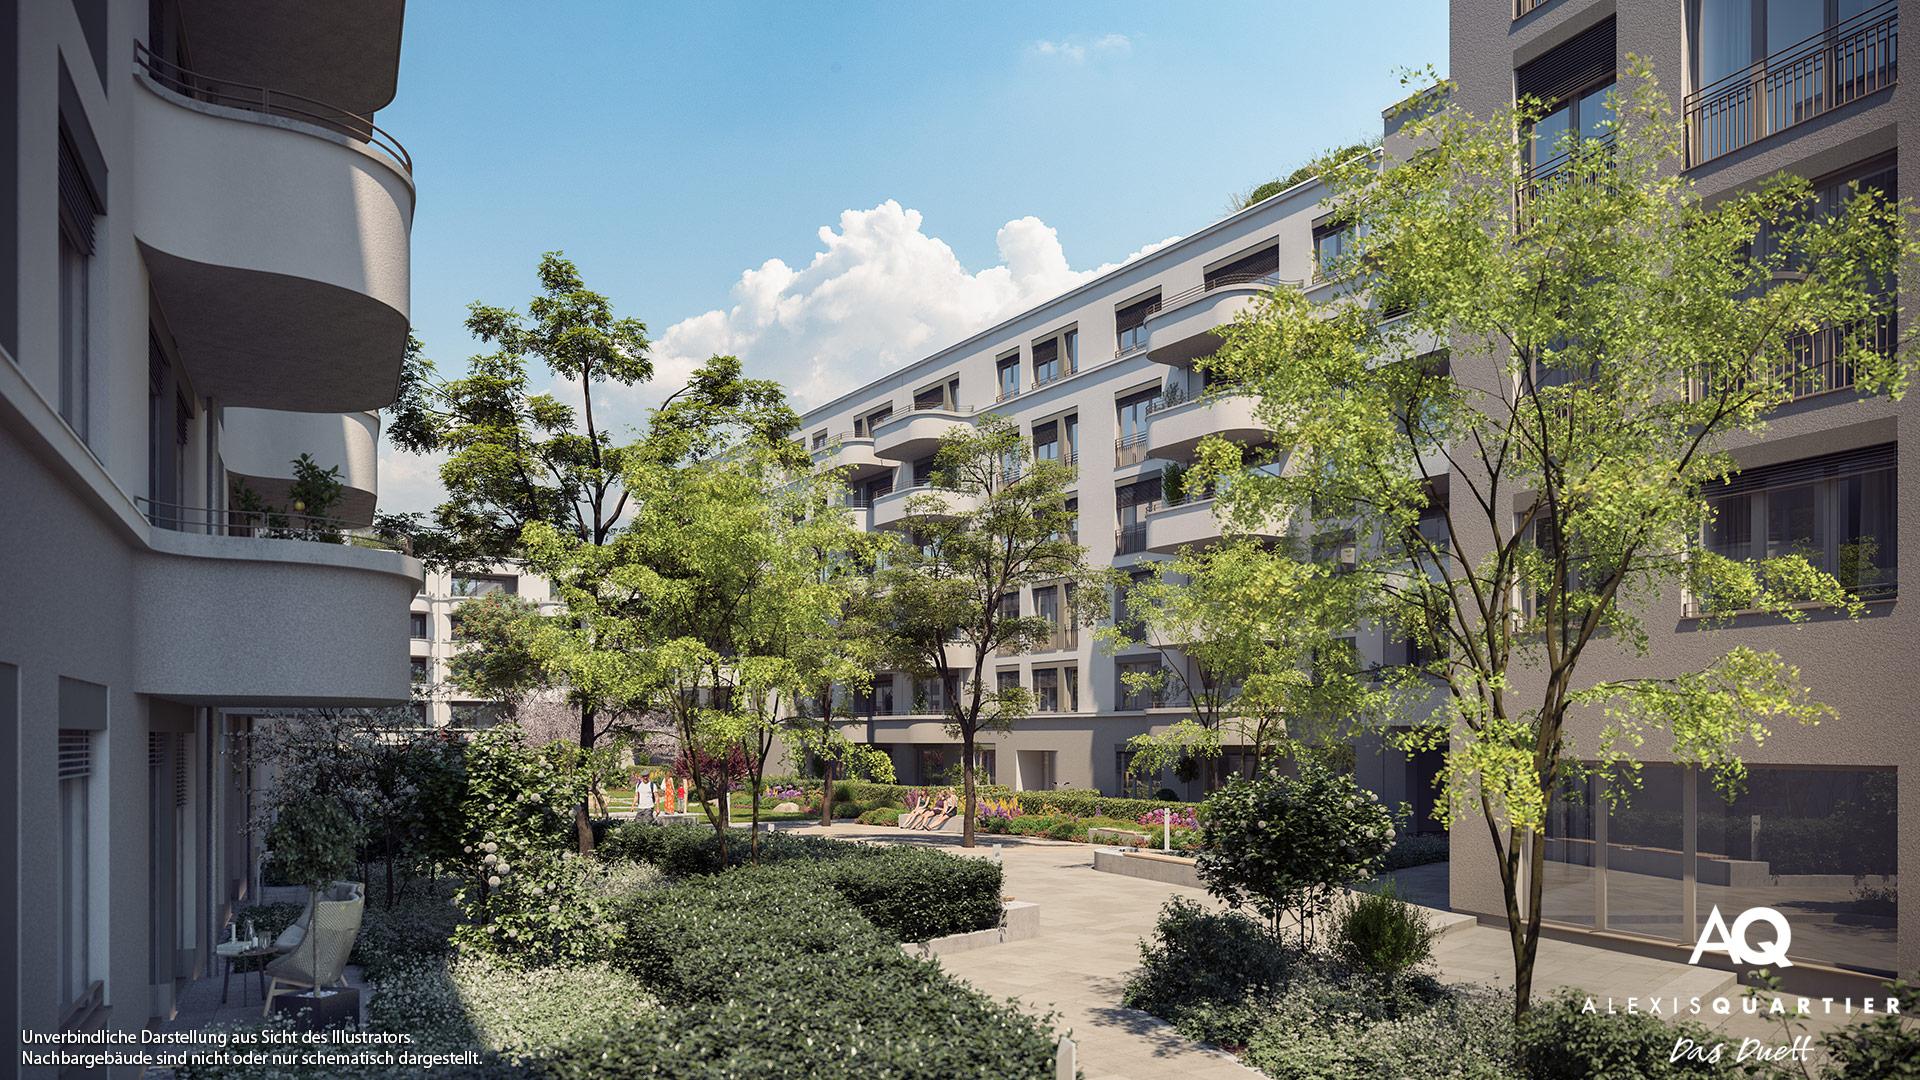 Immobilie Alexisquartier - Das Duett - Illustration 5